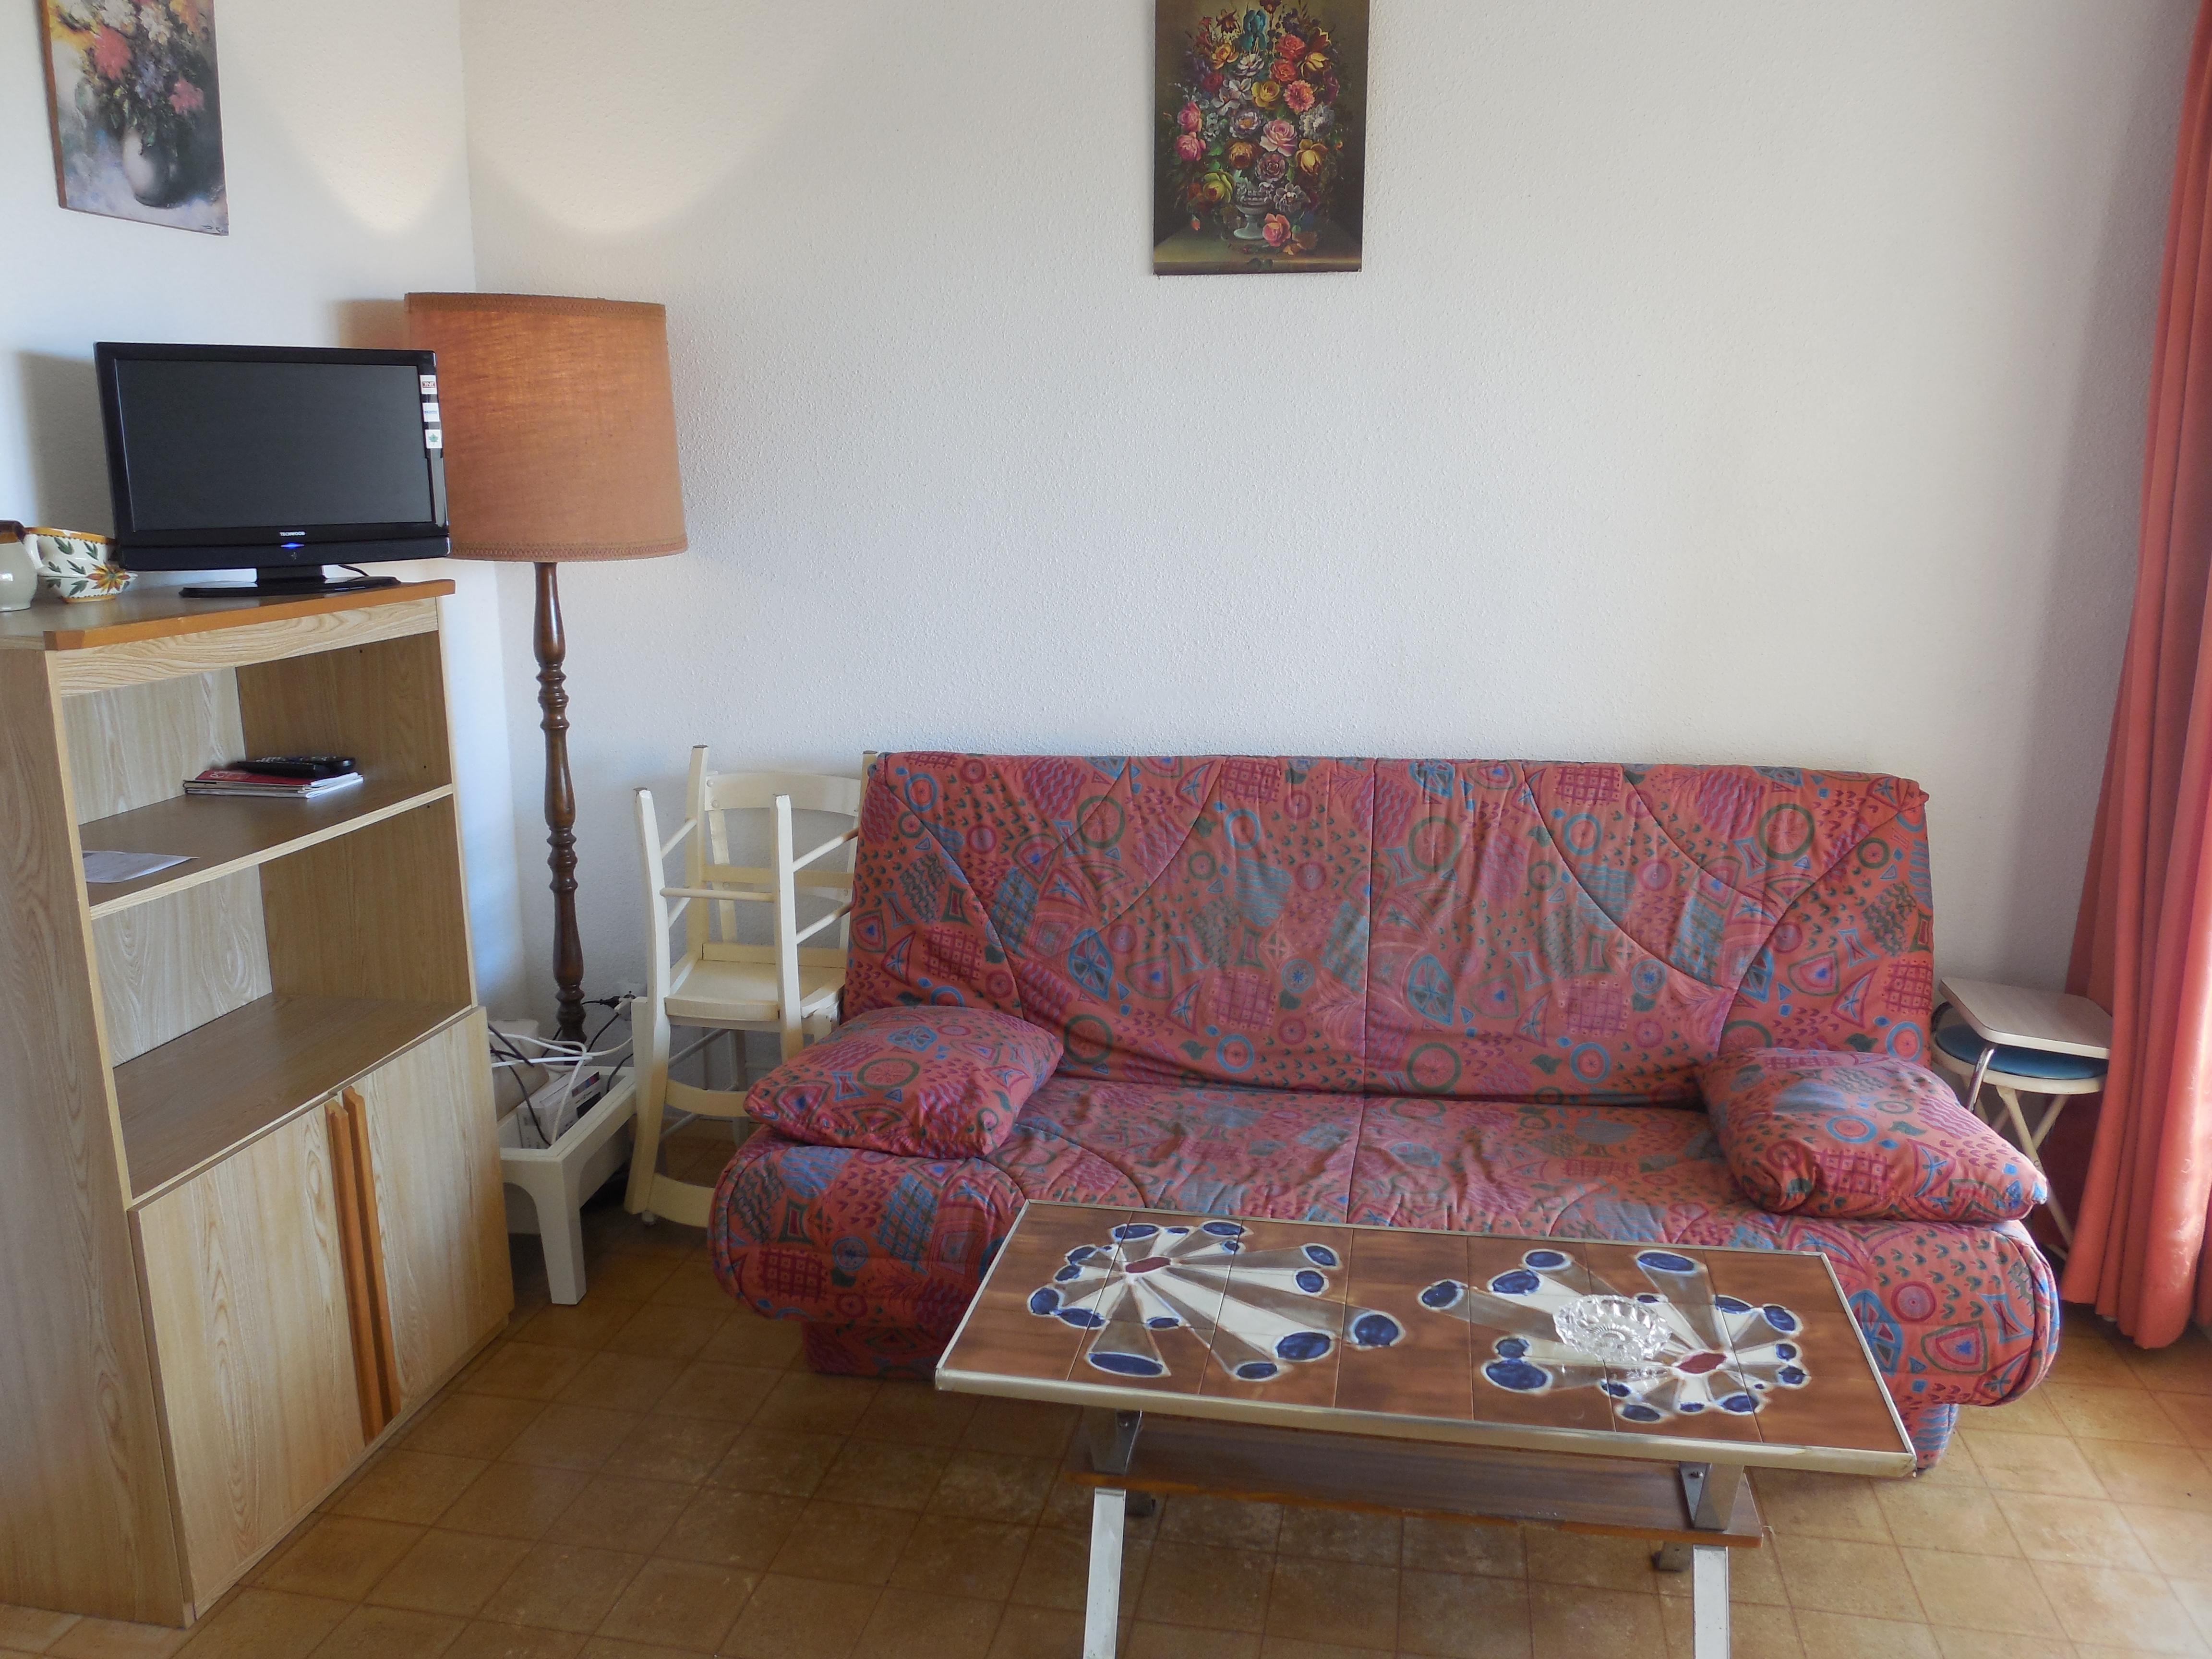 narbonne plage appart t2 cabine agence du soleil location immobili re narbonne plage. Black Bedroom Furniture Sets. Home Design Ideas